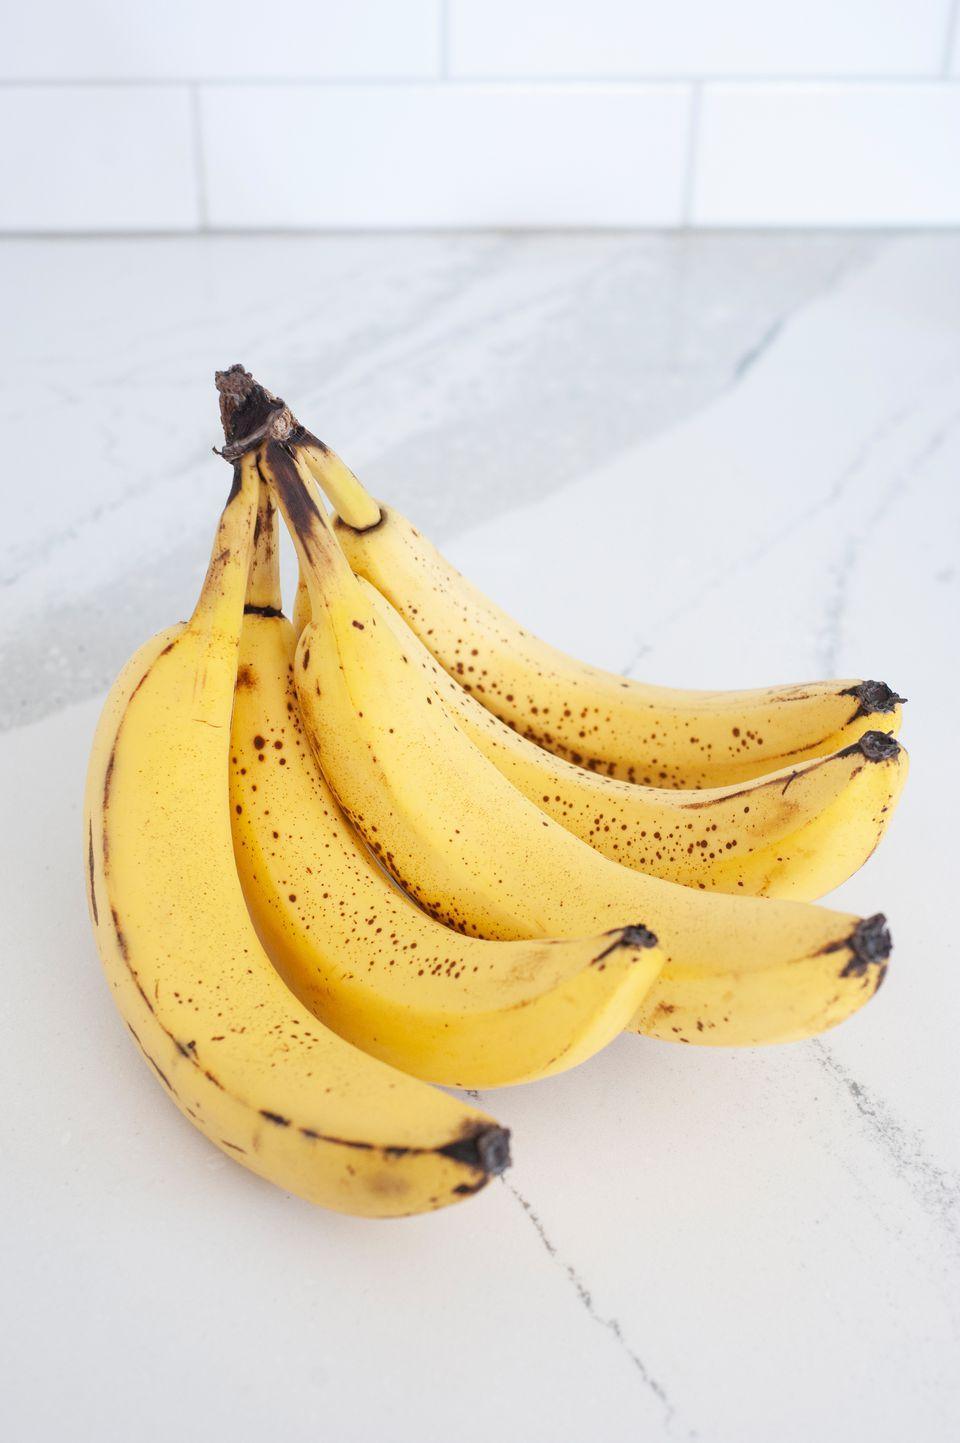 Bunch of bananas on a white countertop